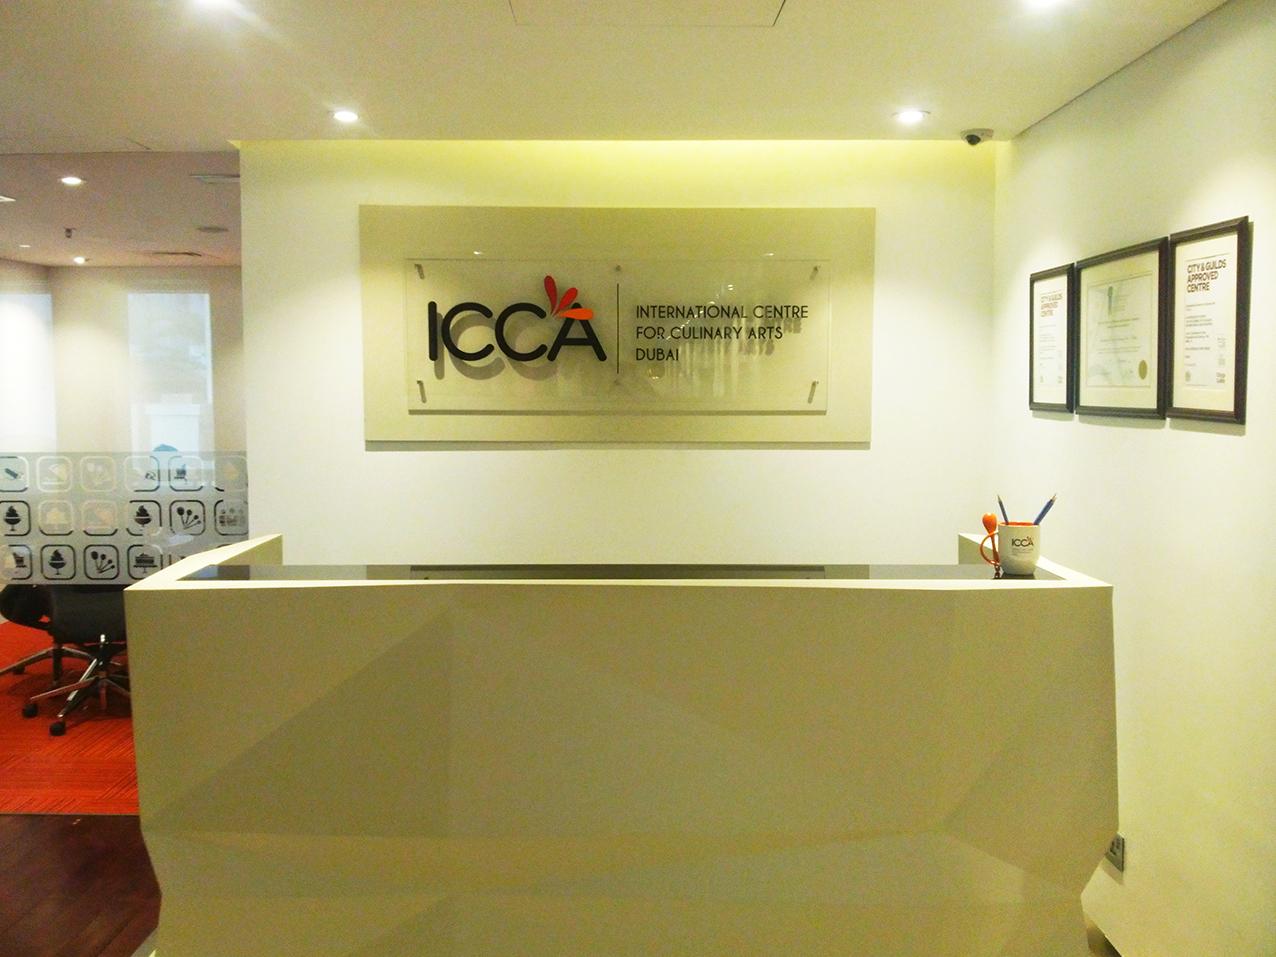 Gallery almamzar decor cont llc for International home decor llc